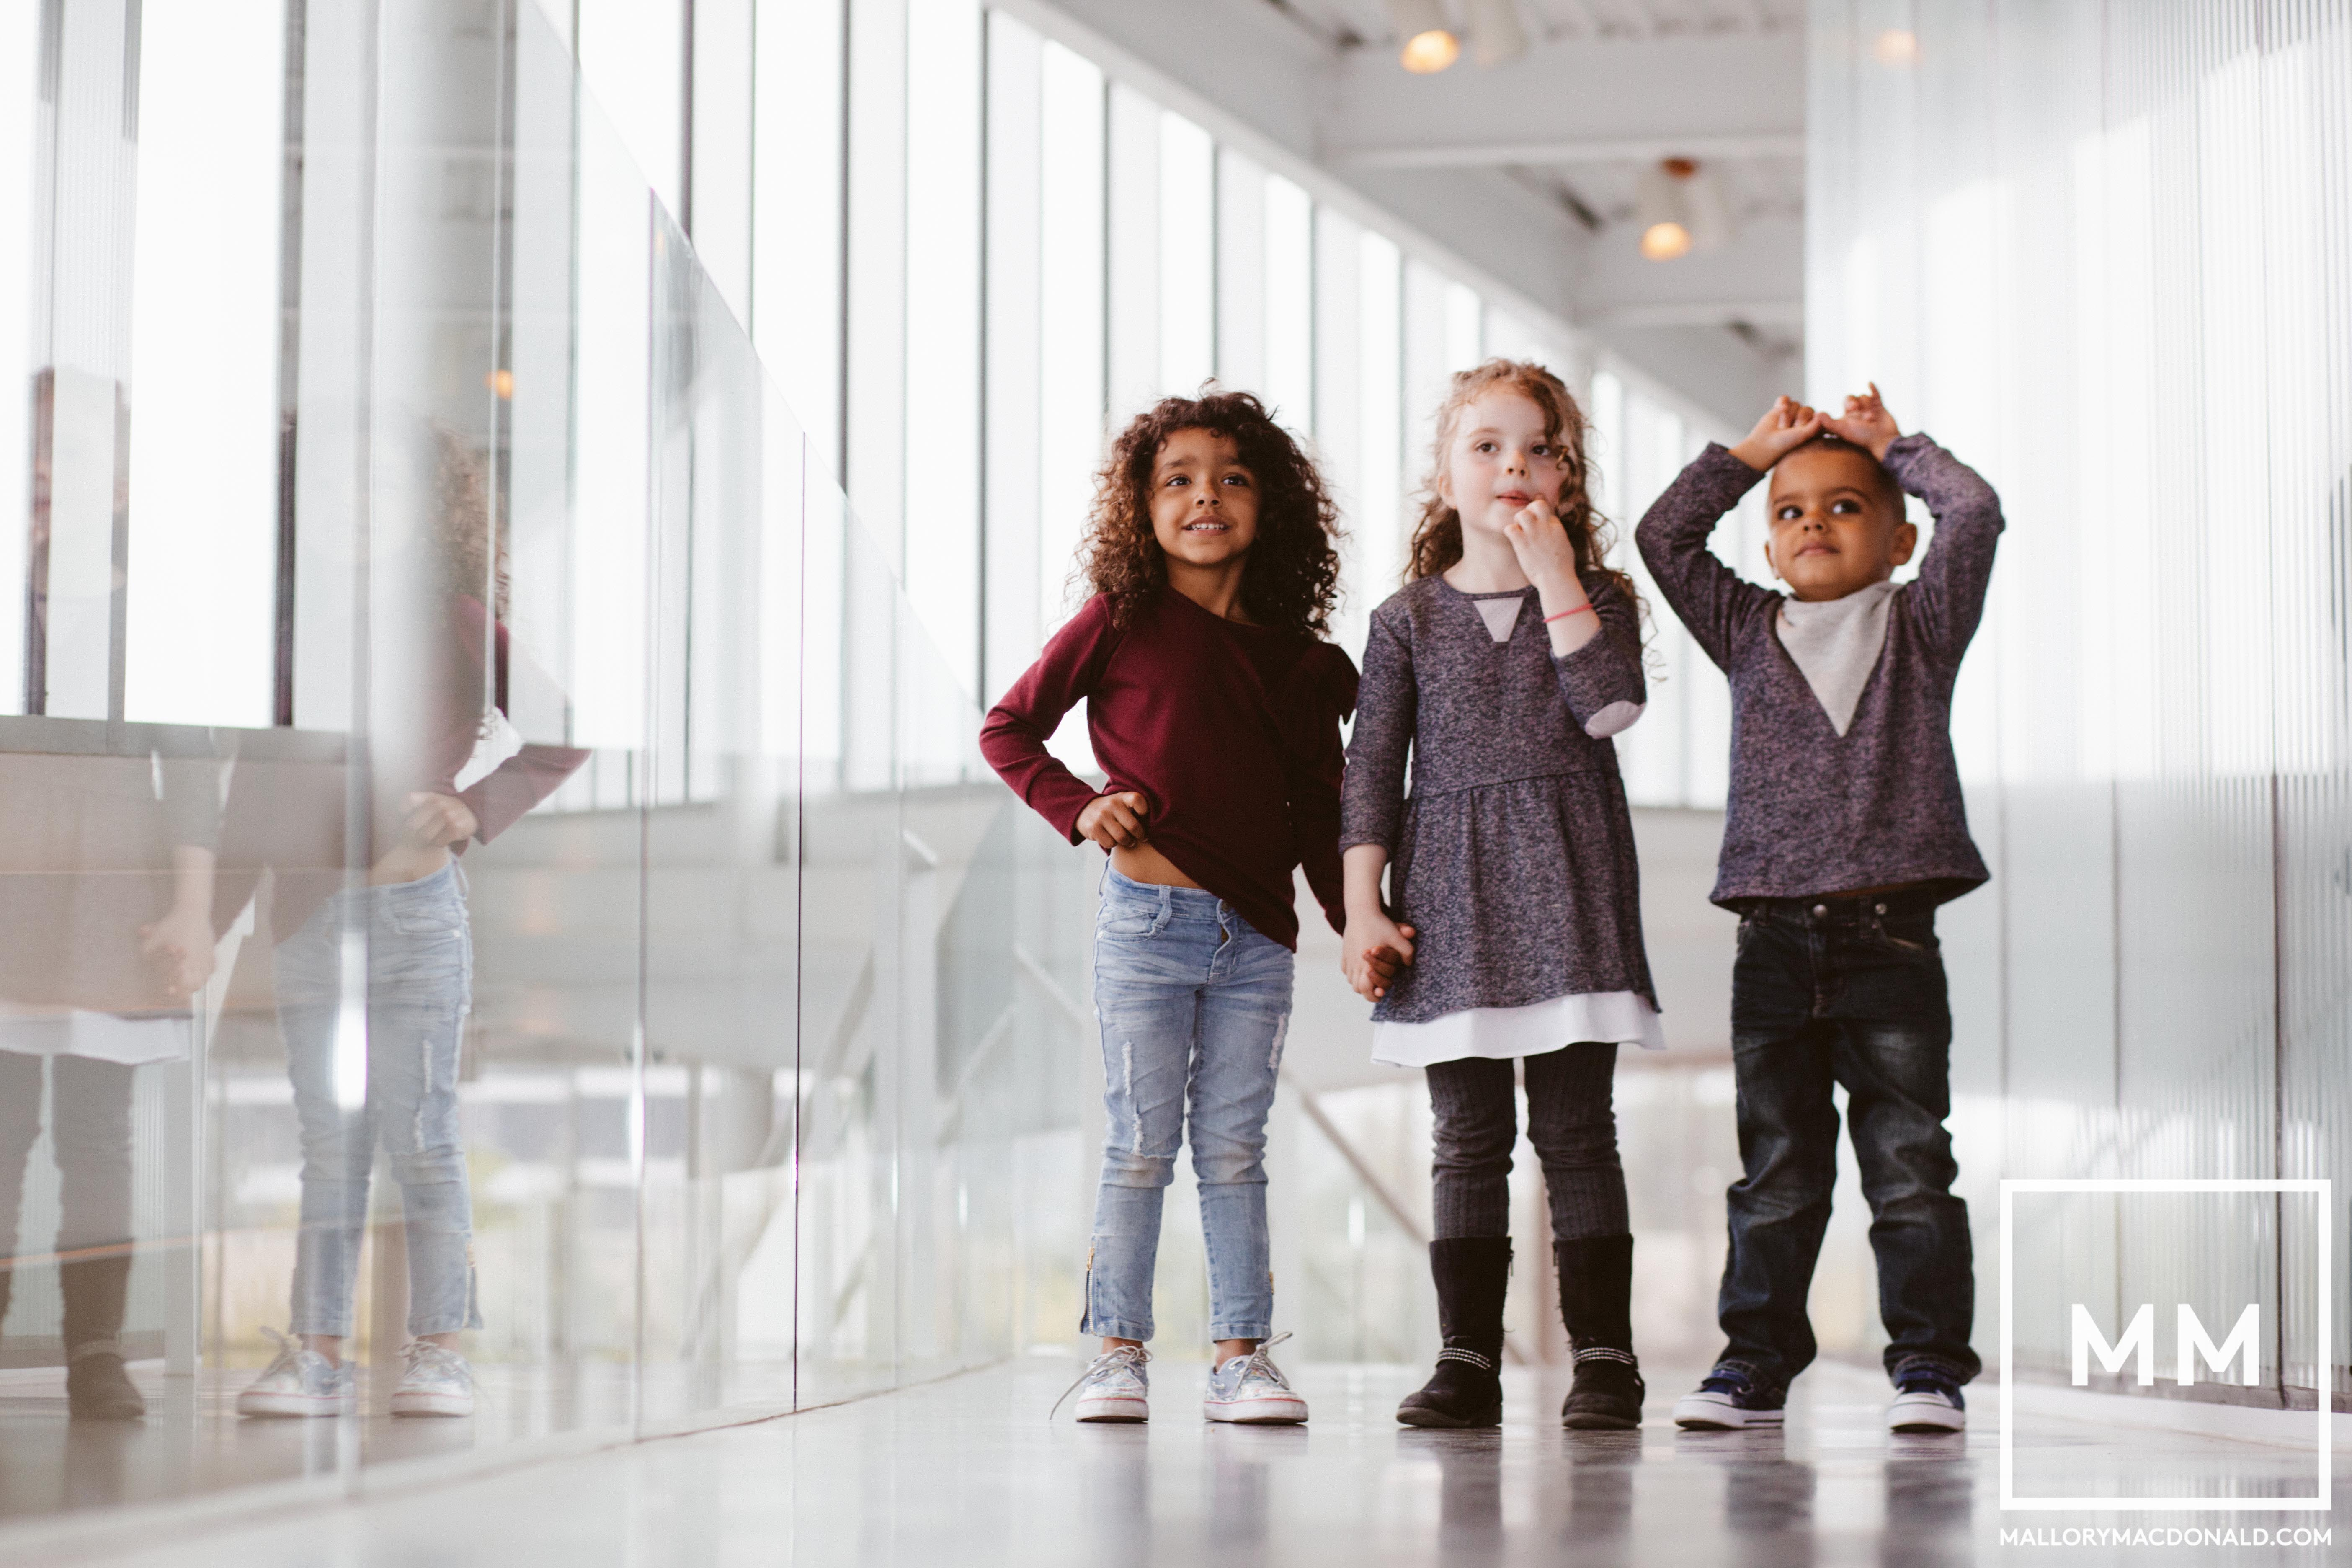 seattle-childrens photographer-mallory macdonald-seattle art museum-sculpture park-sam-2060